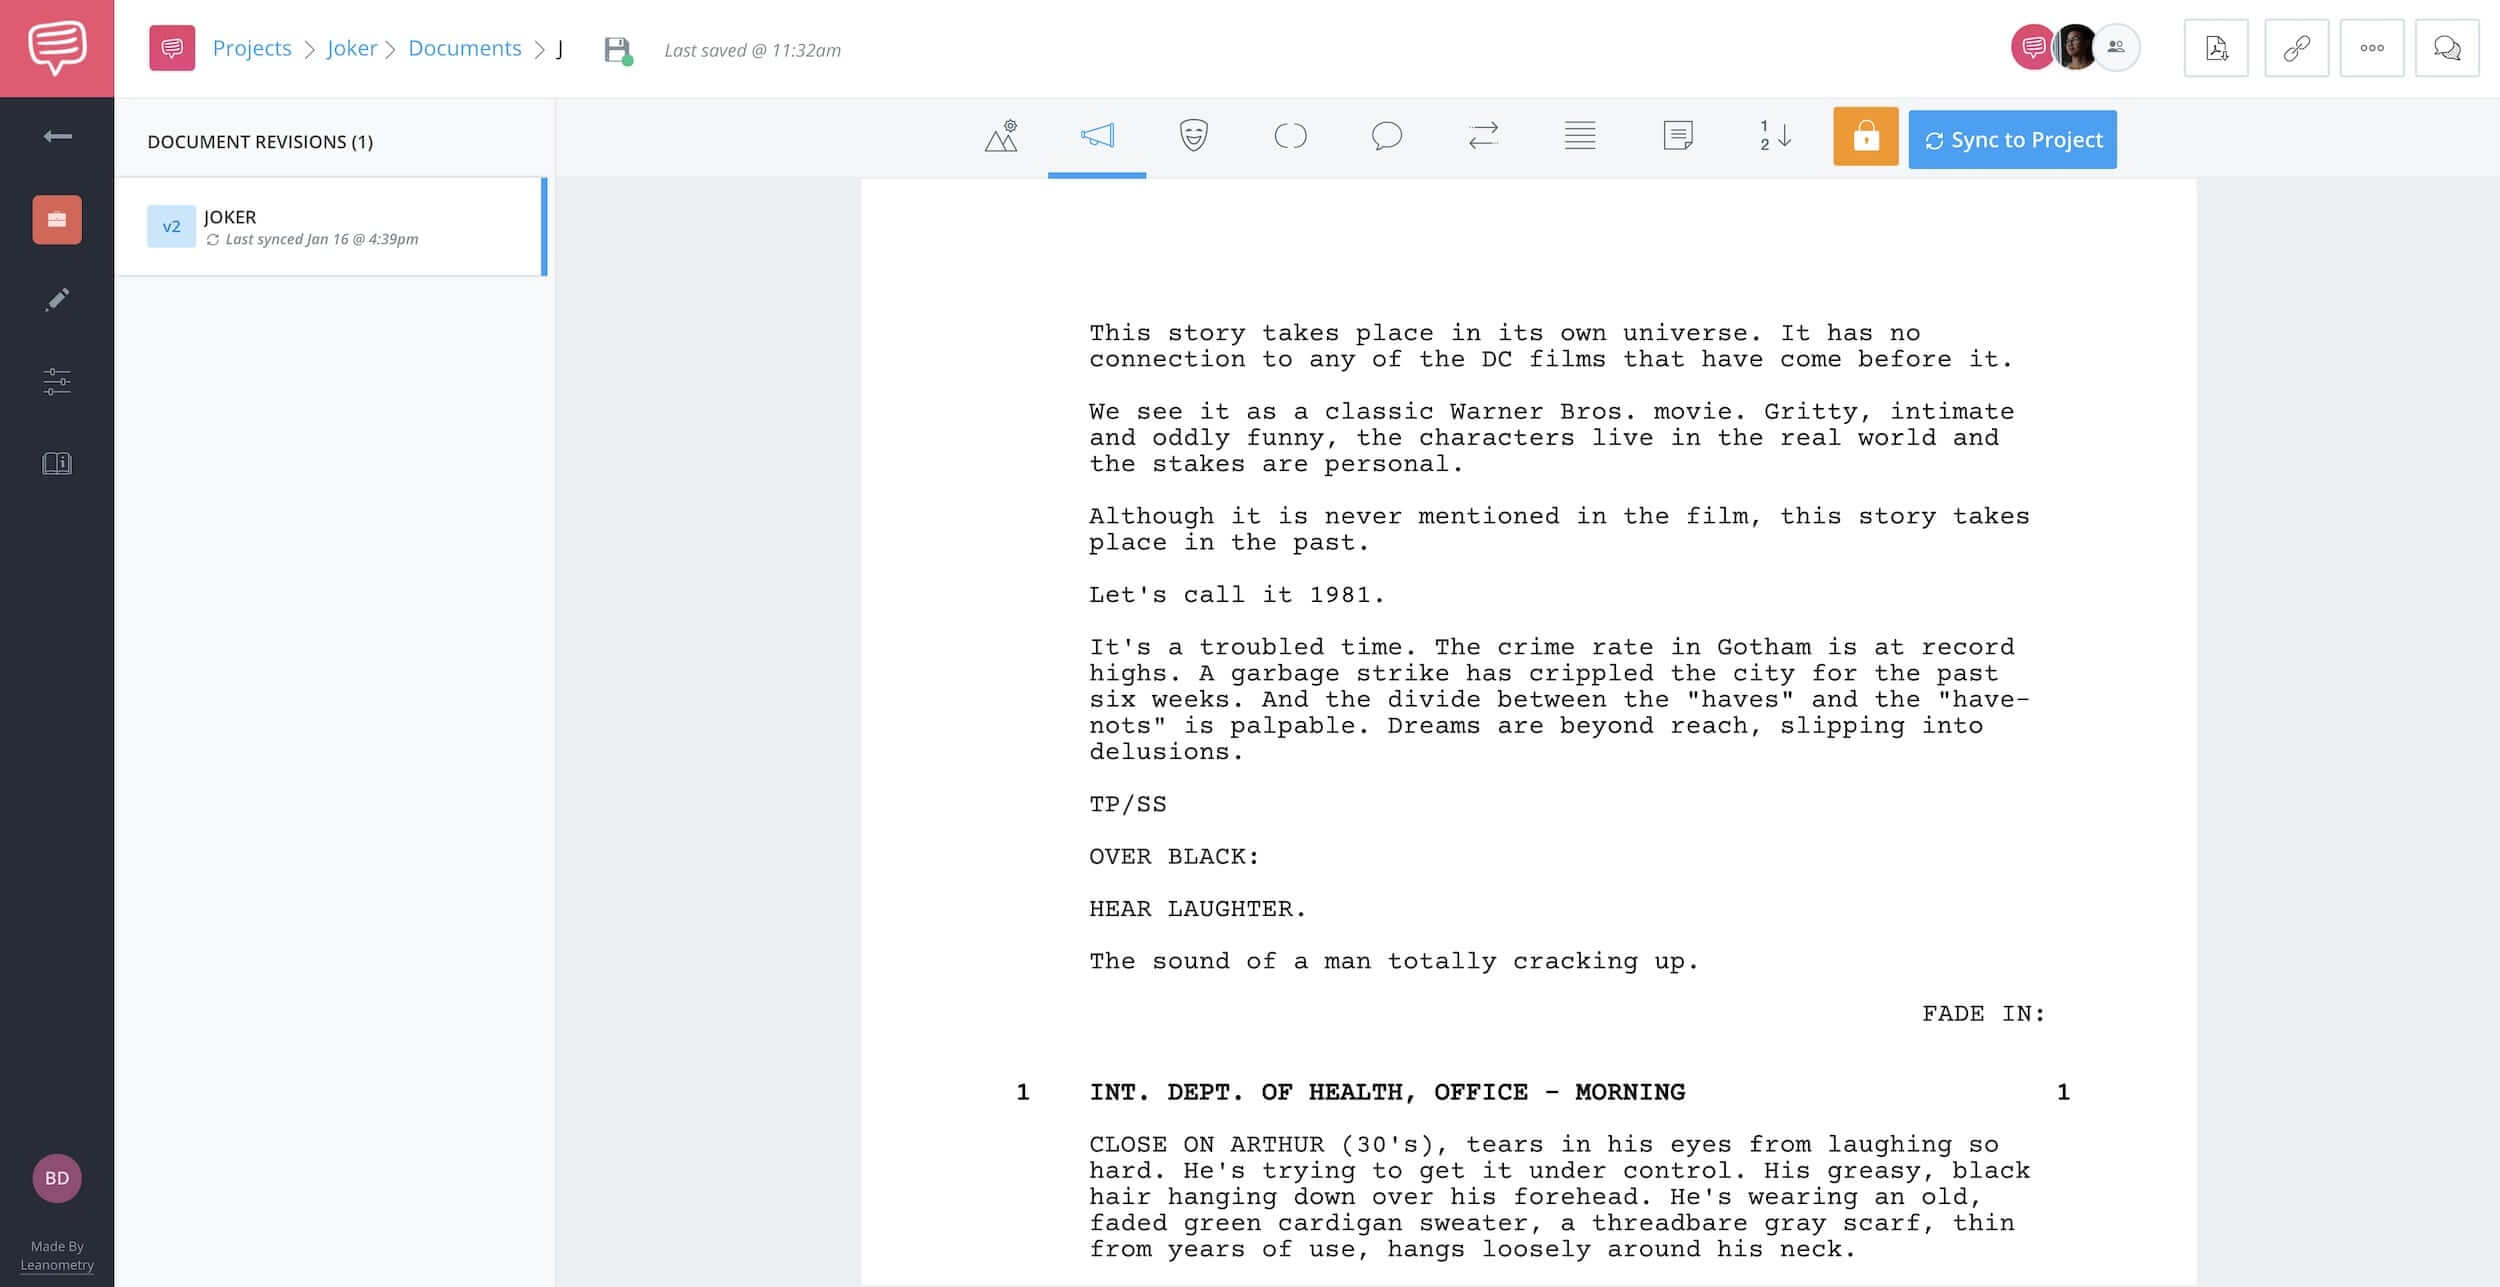 Joker Script Screenplay PDF Download - Complete Script - StudioBinder Screenwriting Software